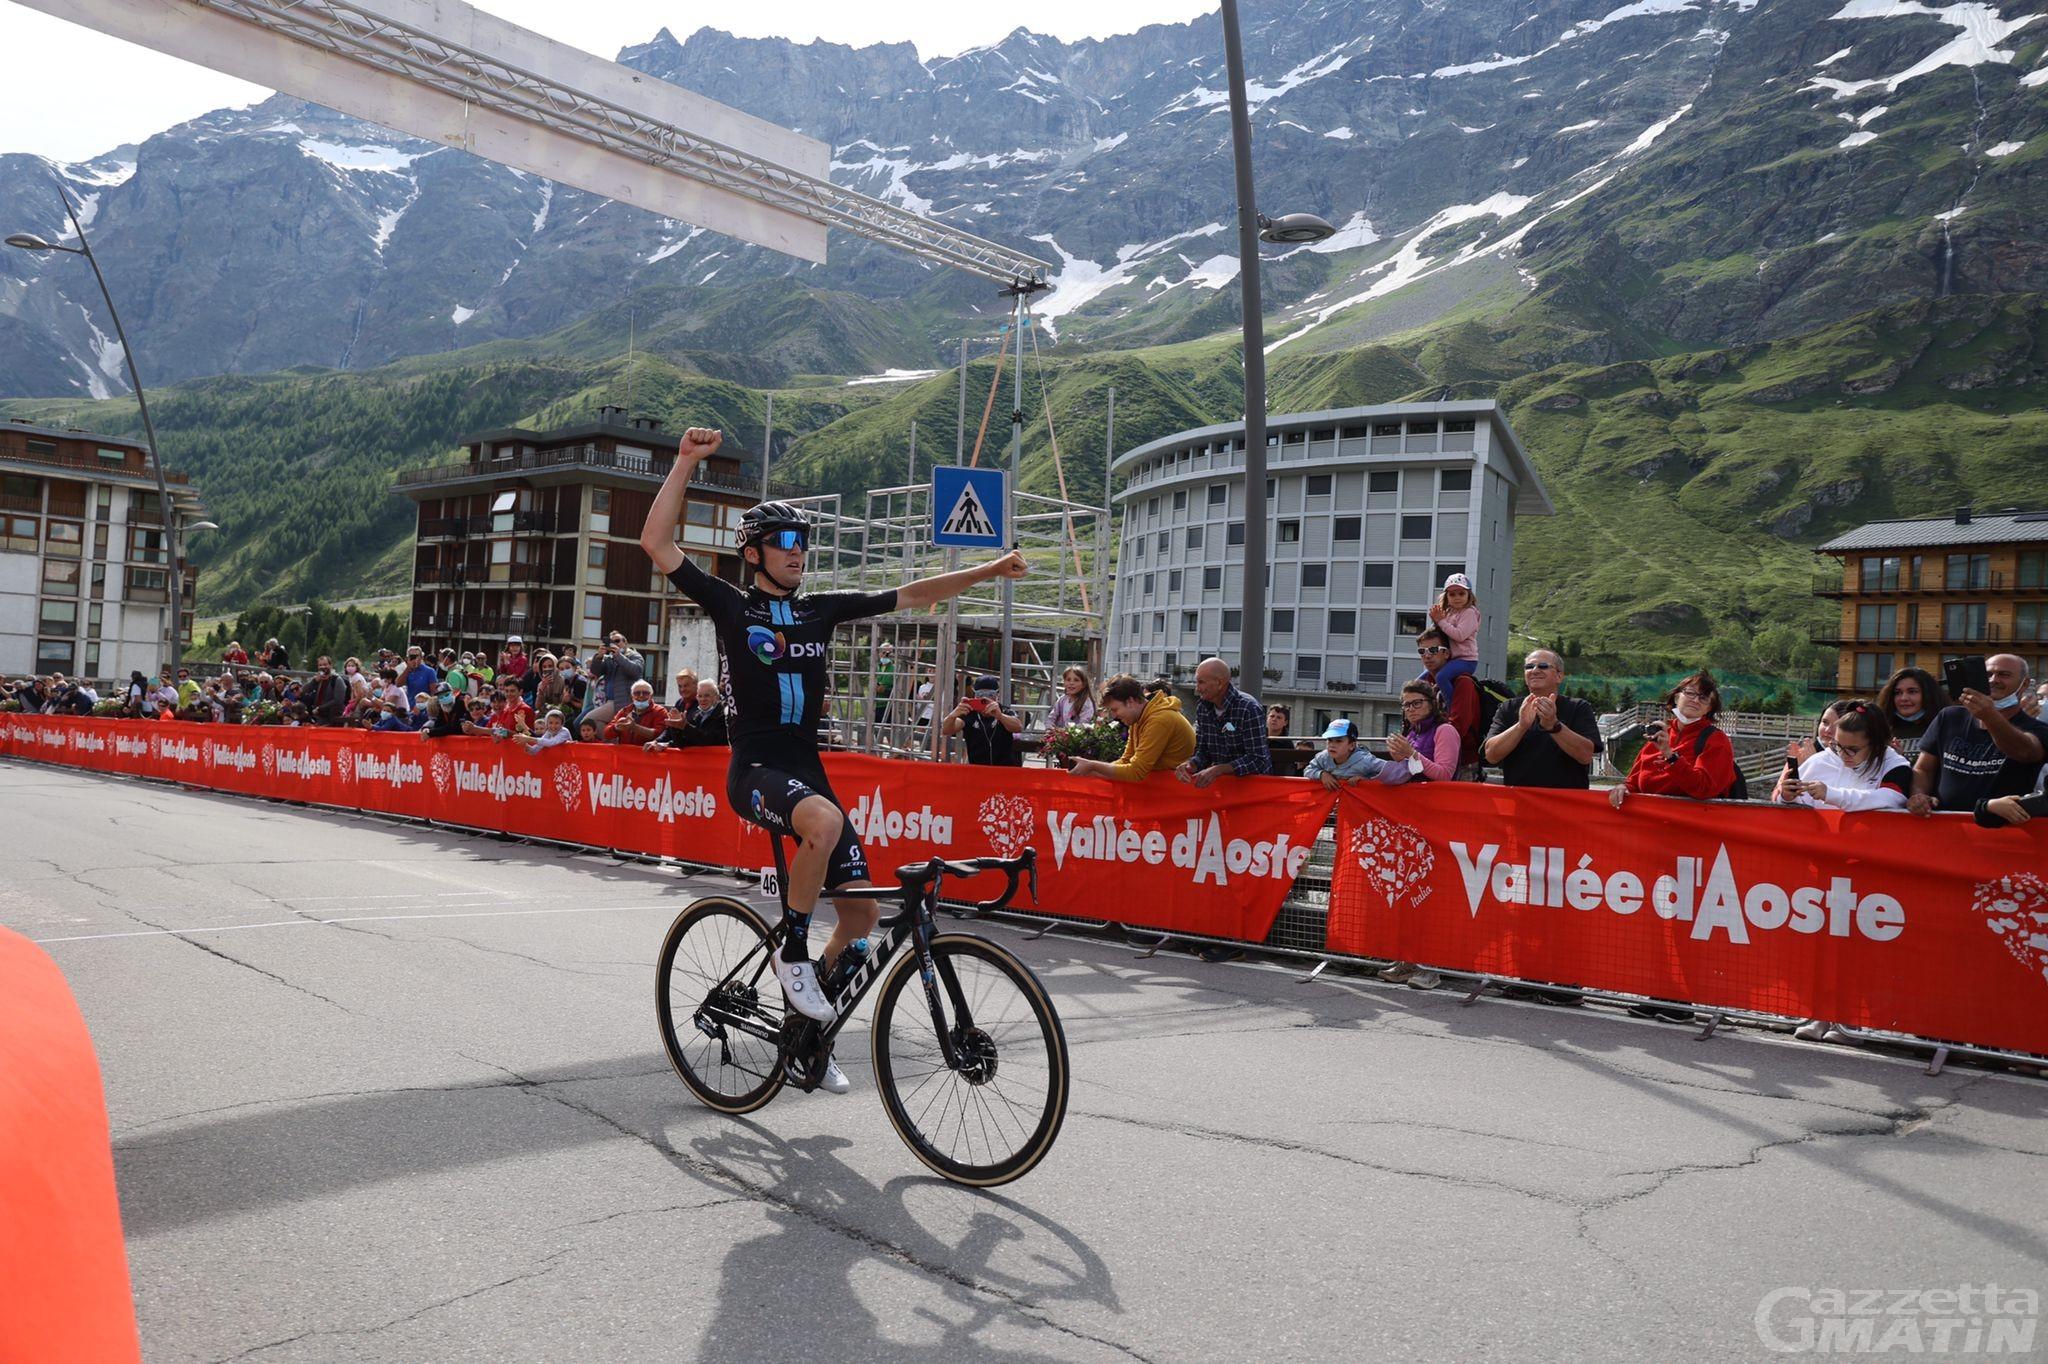 Giro della Valle d'Aosta: Gianmarco Garofoli domina la seconda tappa